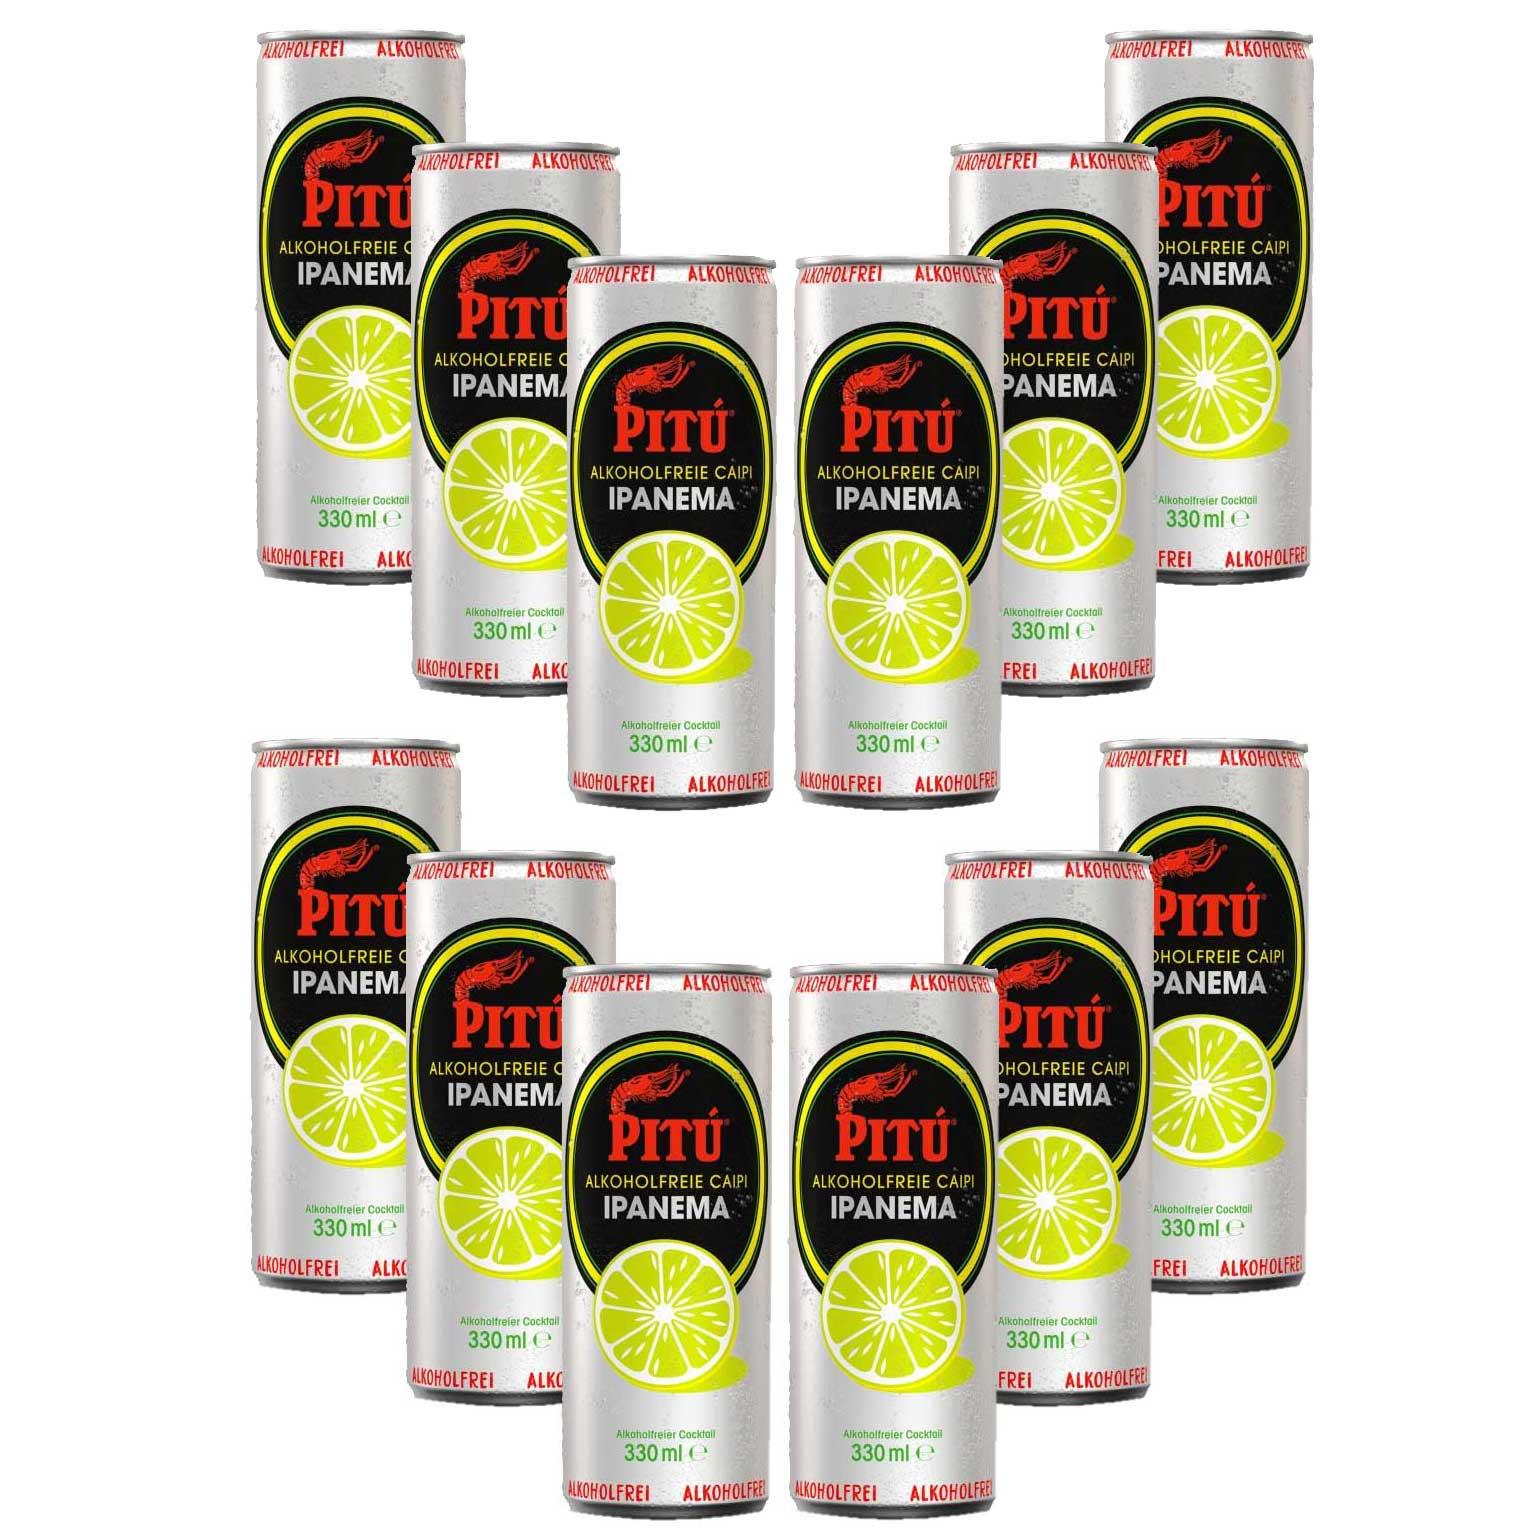 Pitu Ipanema 12er Set alkoholfreier fertig Cocktail 12x 0,33L ready to drink ohne Alkohol inklusive Pfand EINWEG